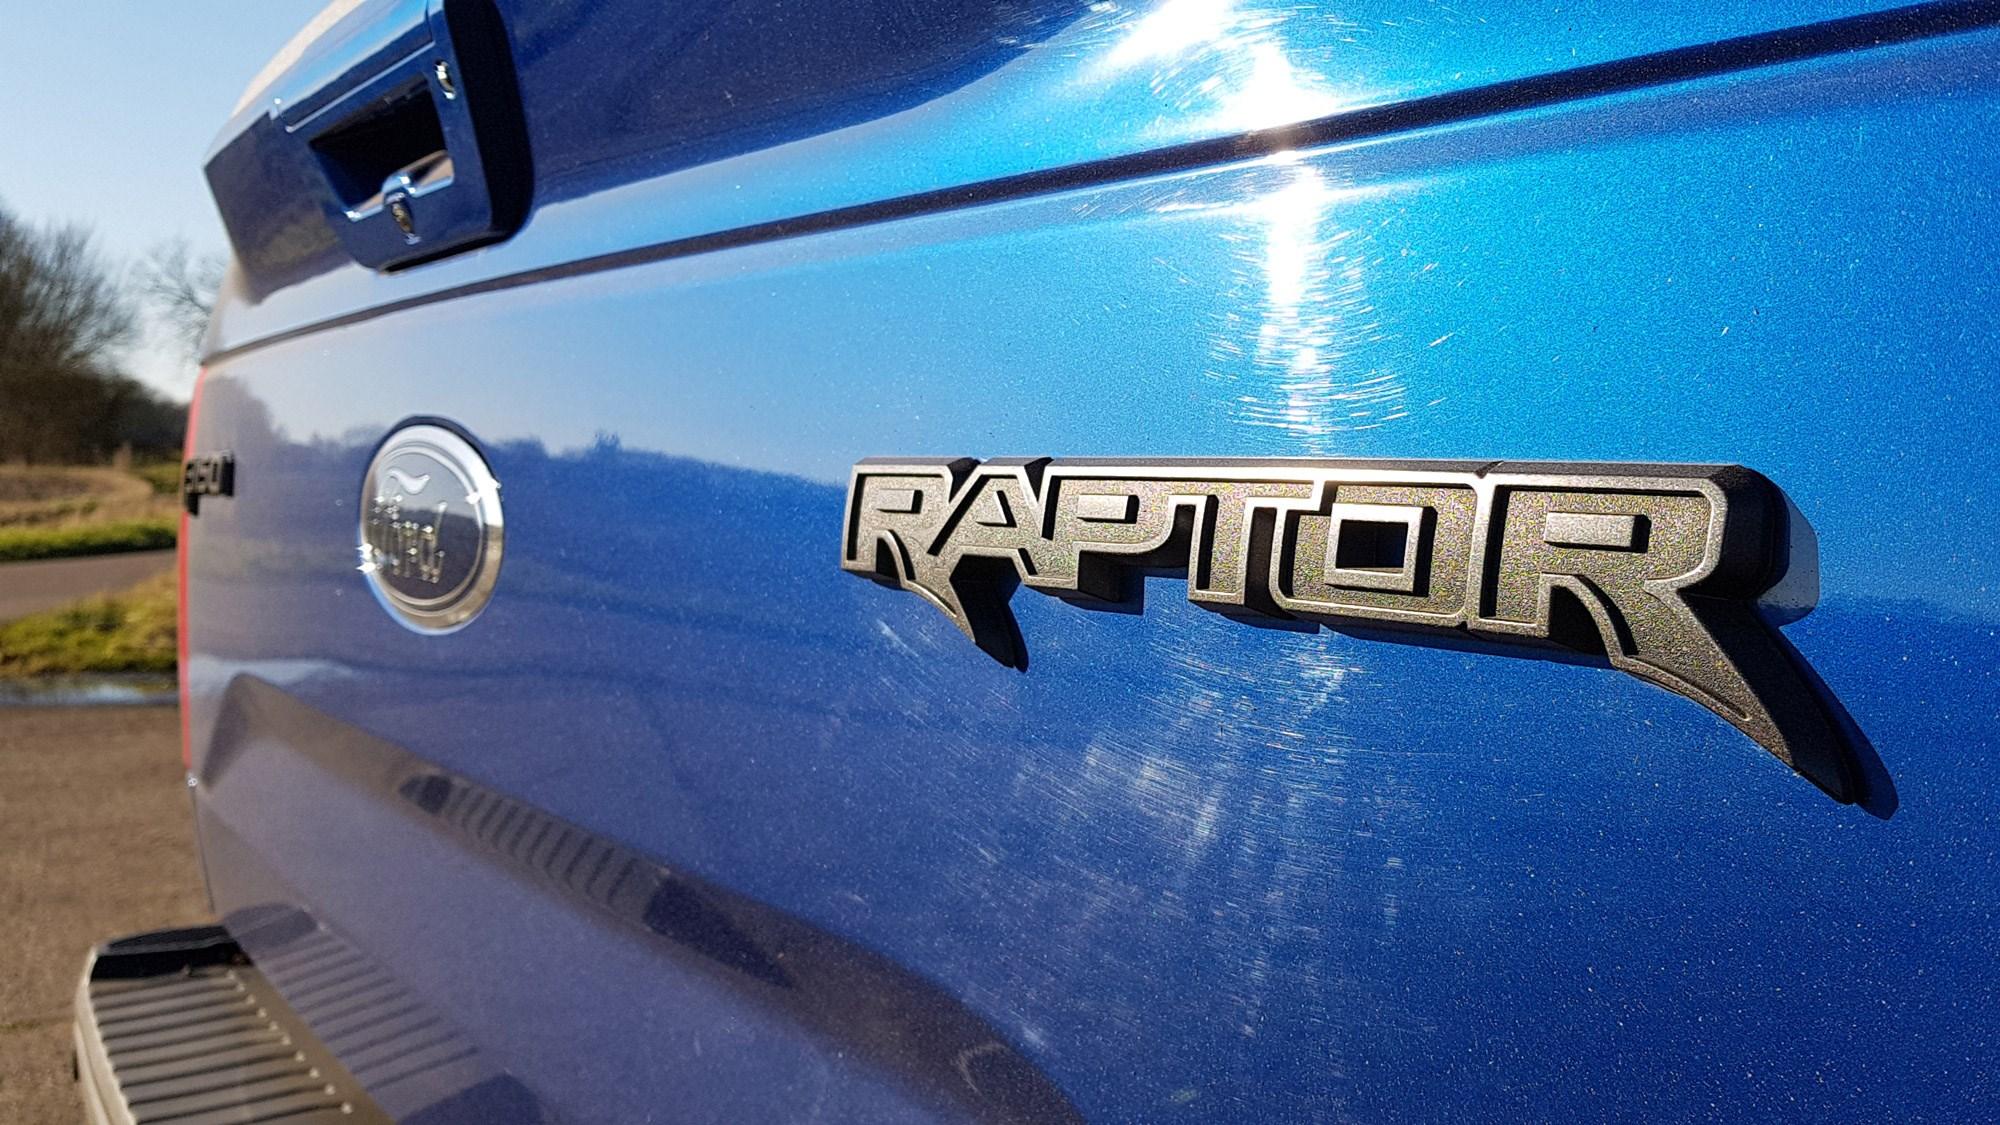 Ford Raptor rear badge